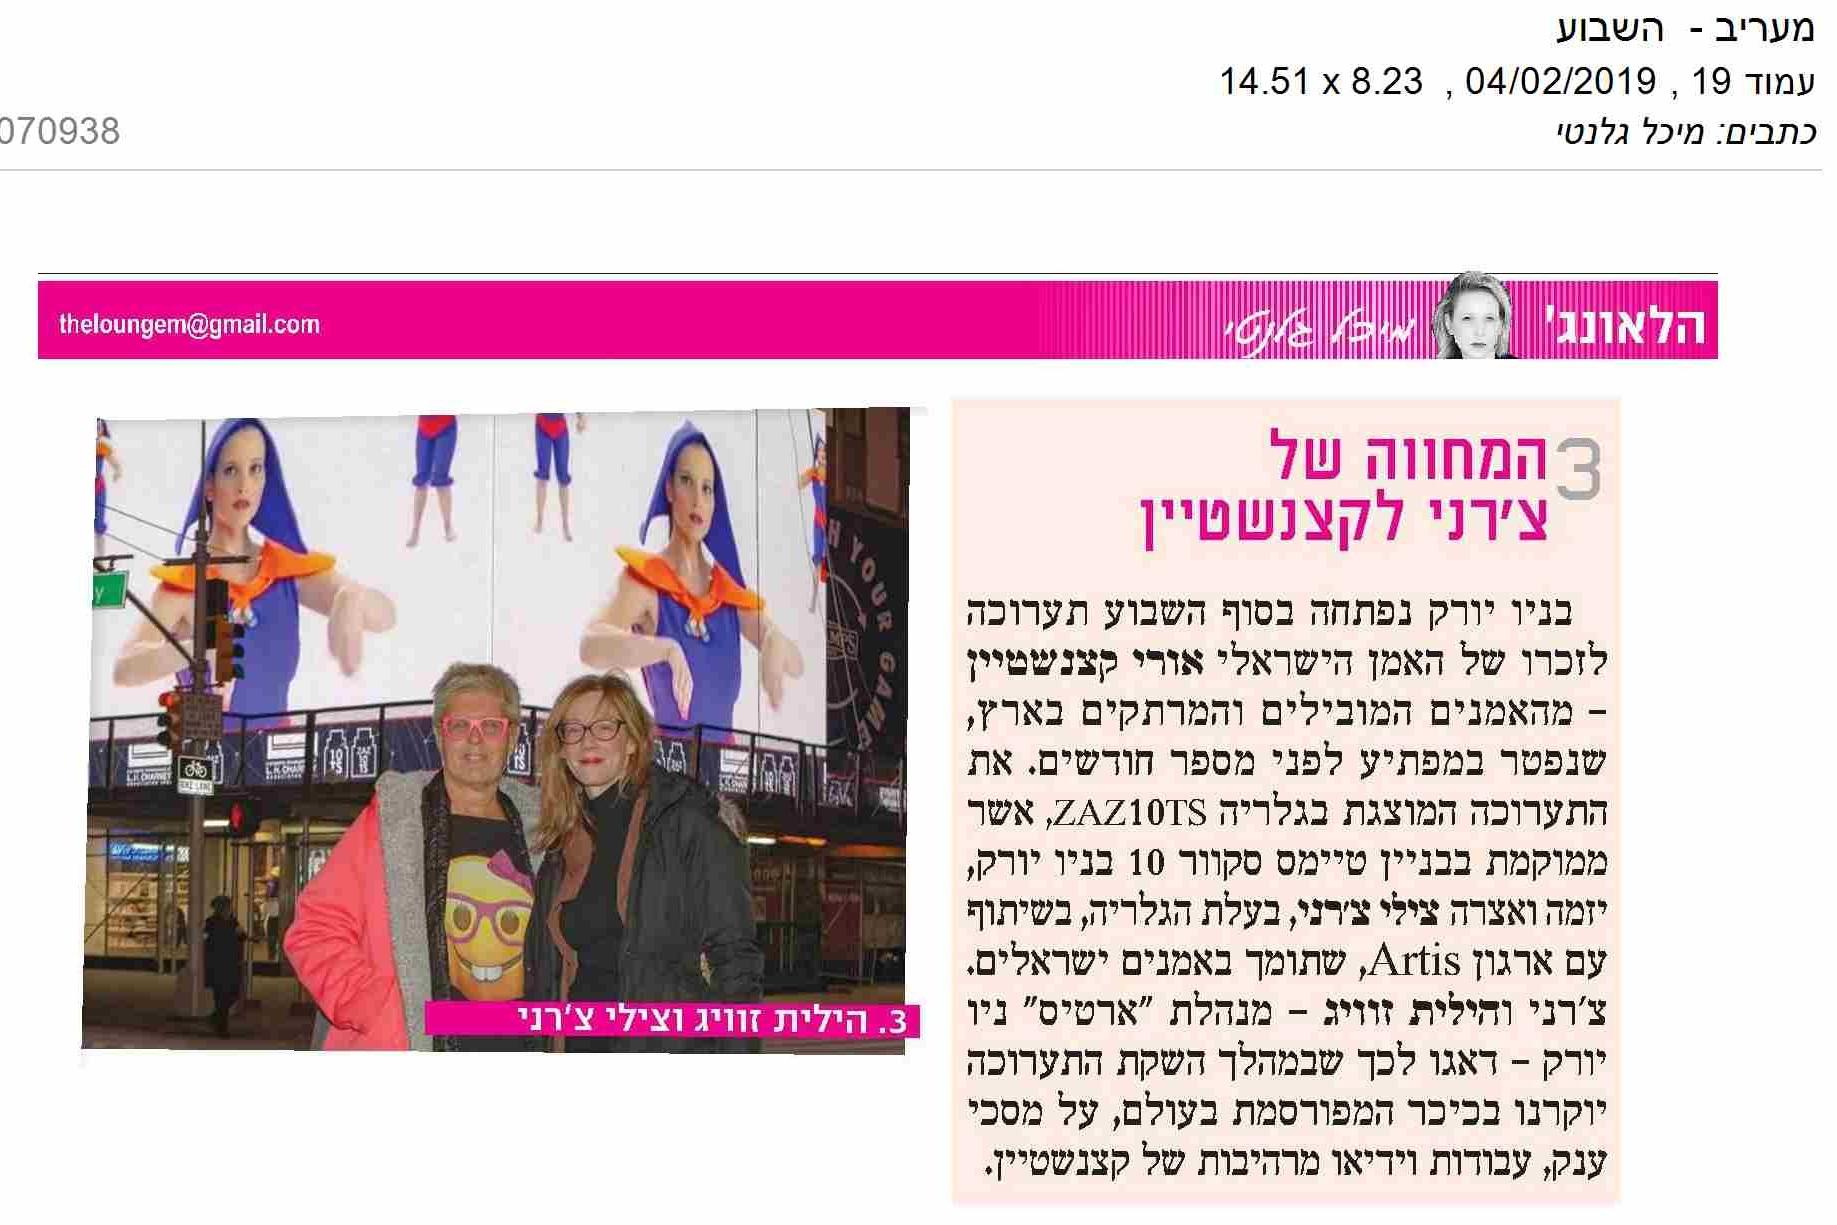 Maariv  - The Lounge | February 4, 2019